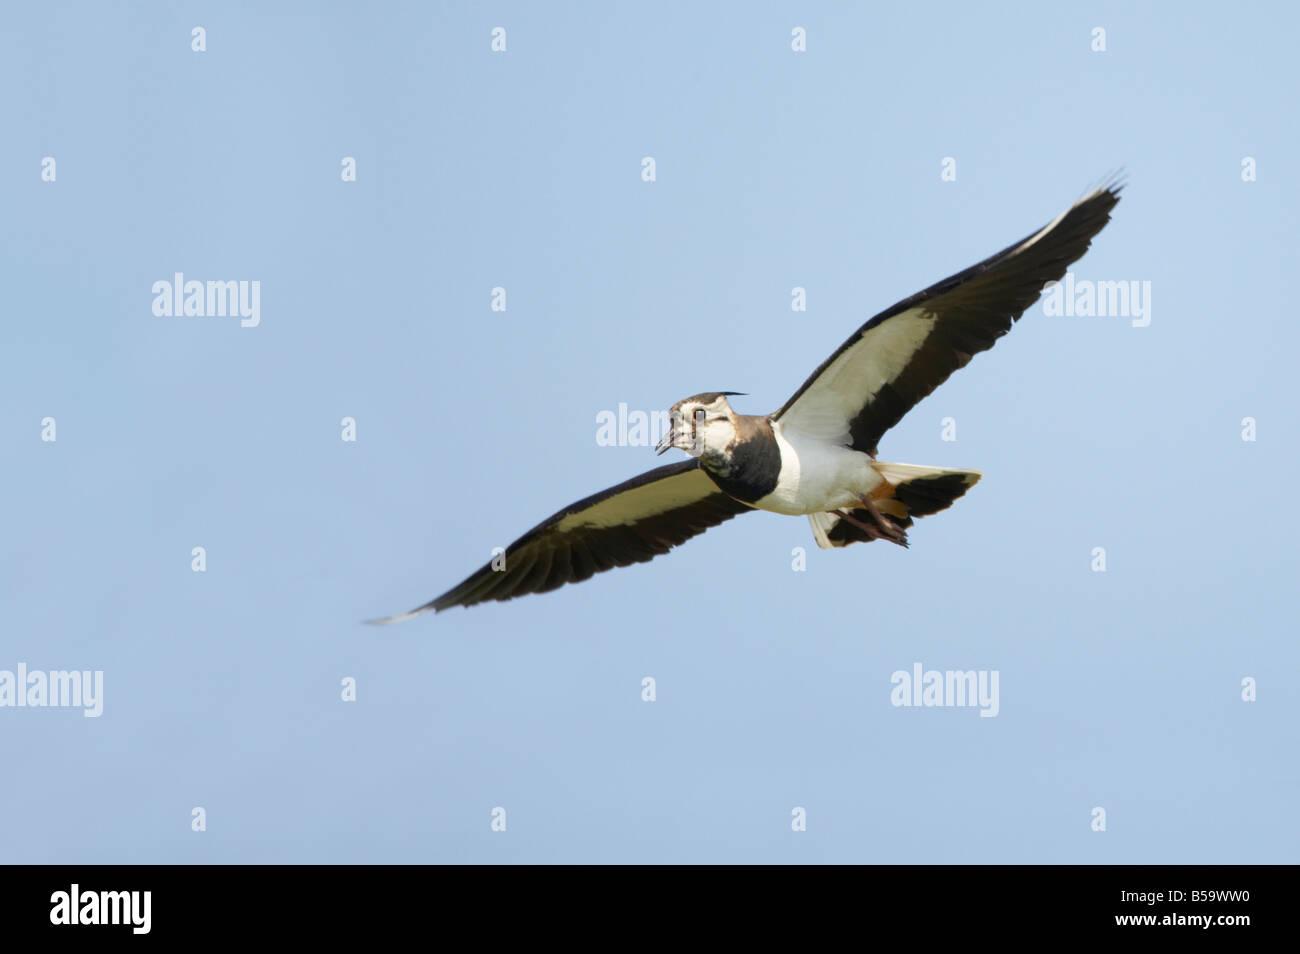 Lapwing Calling in flight Venellus venellus South Uist Outer hebrides Scotland UK BI016752 - Stock Image